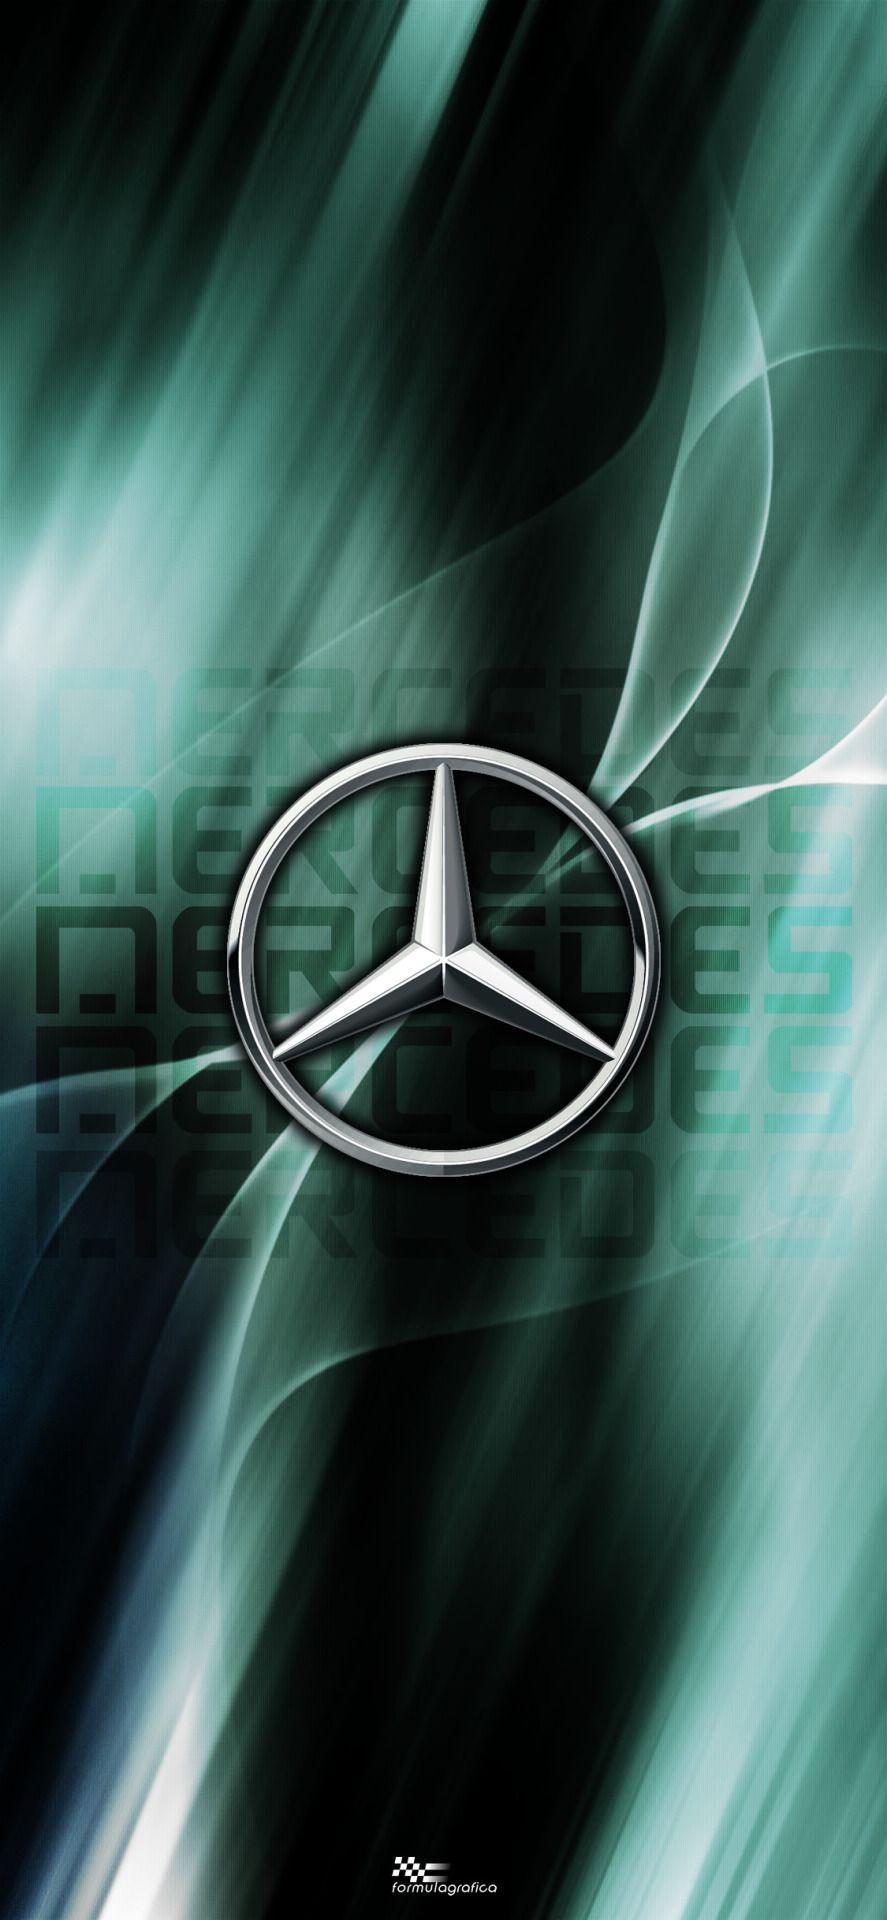 Iphone Smartphone Wallpaper 2019 Formula 1 Season Amazing Fog Mercedes Amg Petronas Motorsport If Y Mercedes Benz Wallpaper Mercedes Wallpaper Mercedes